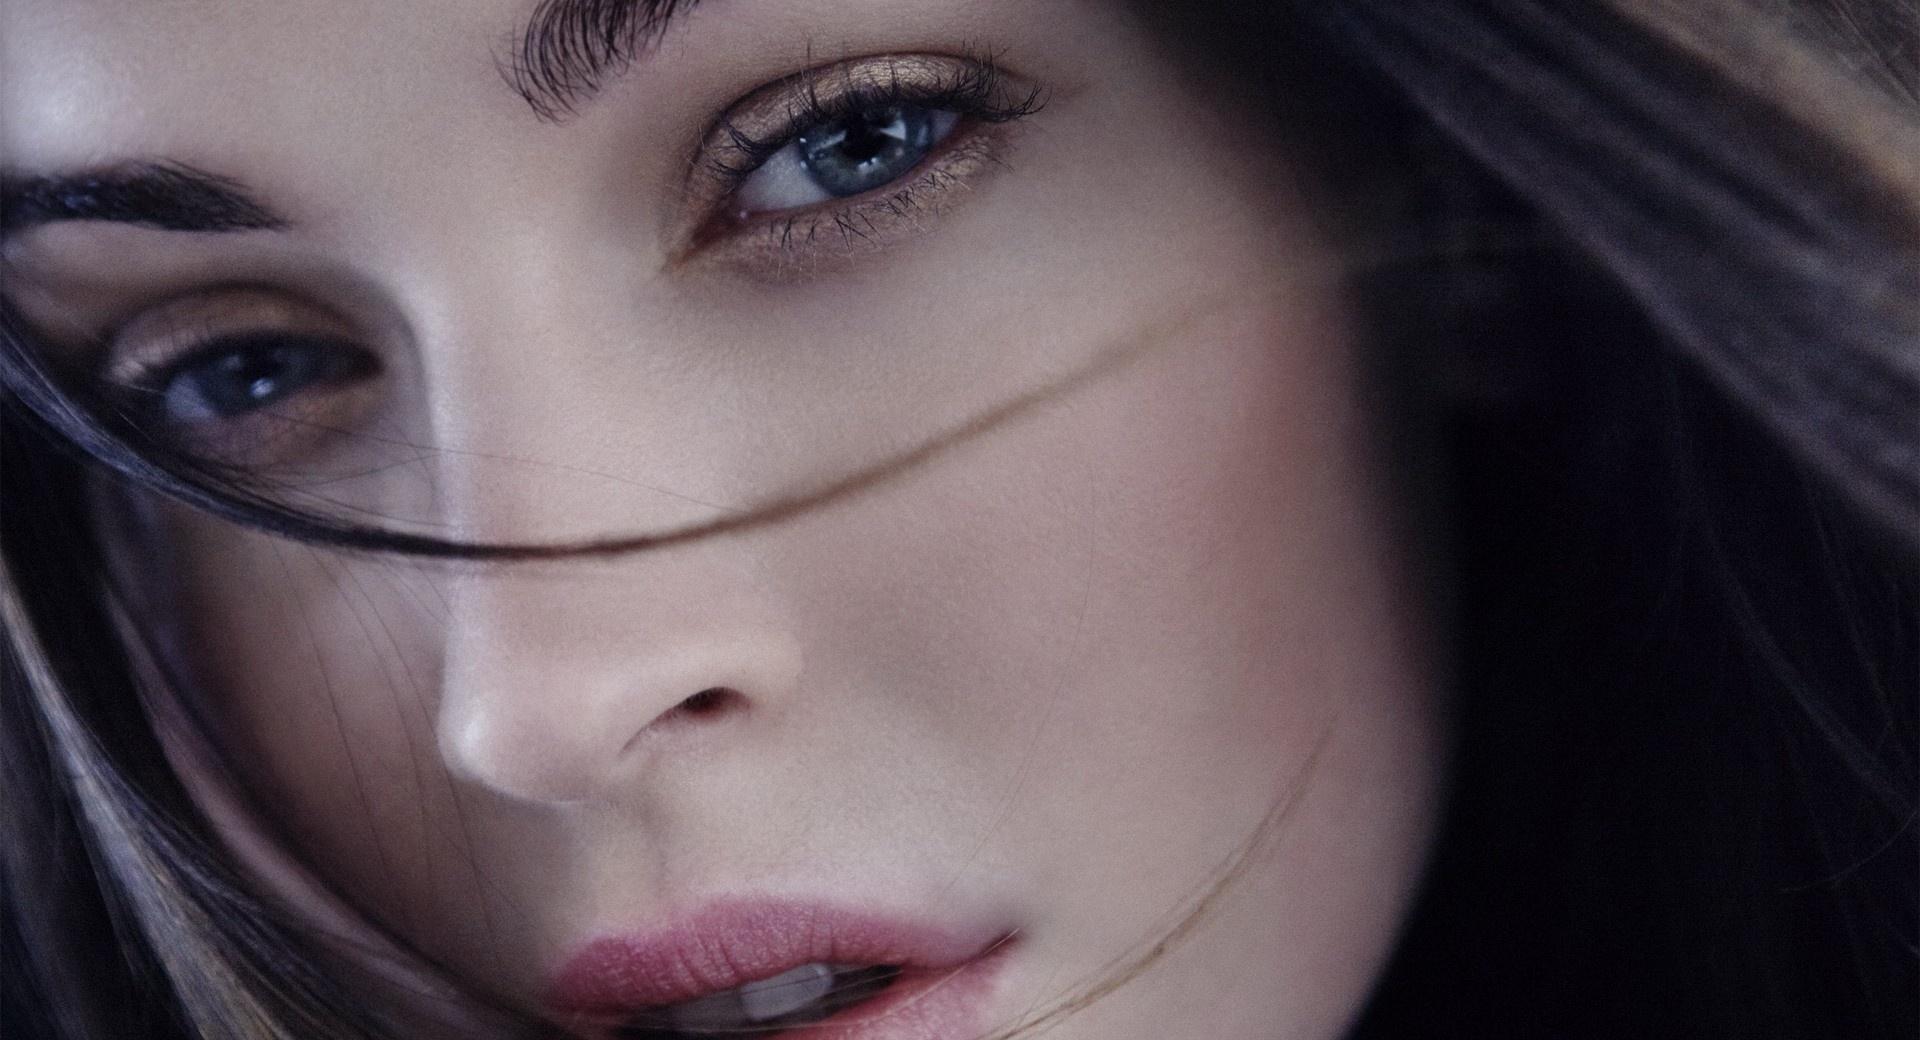 Megan Fox Eyes wallpapers HD quality